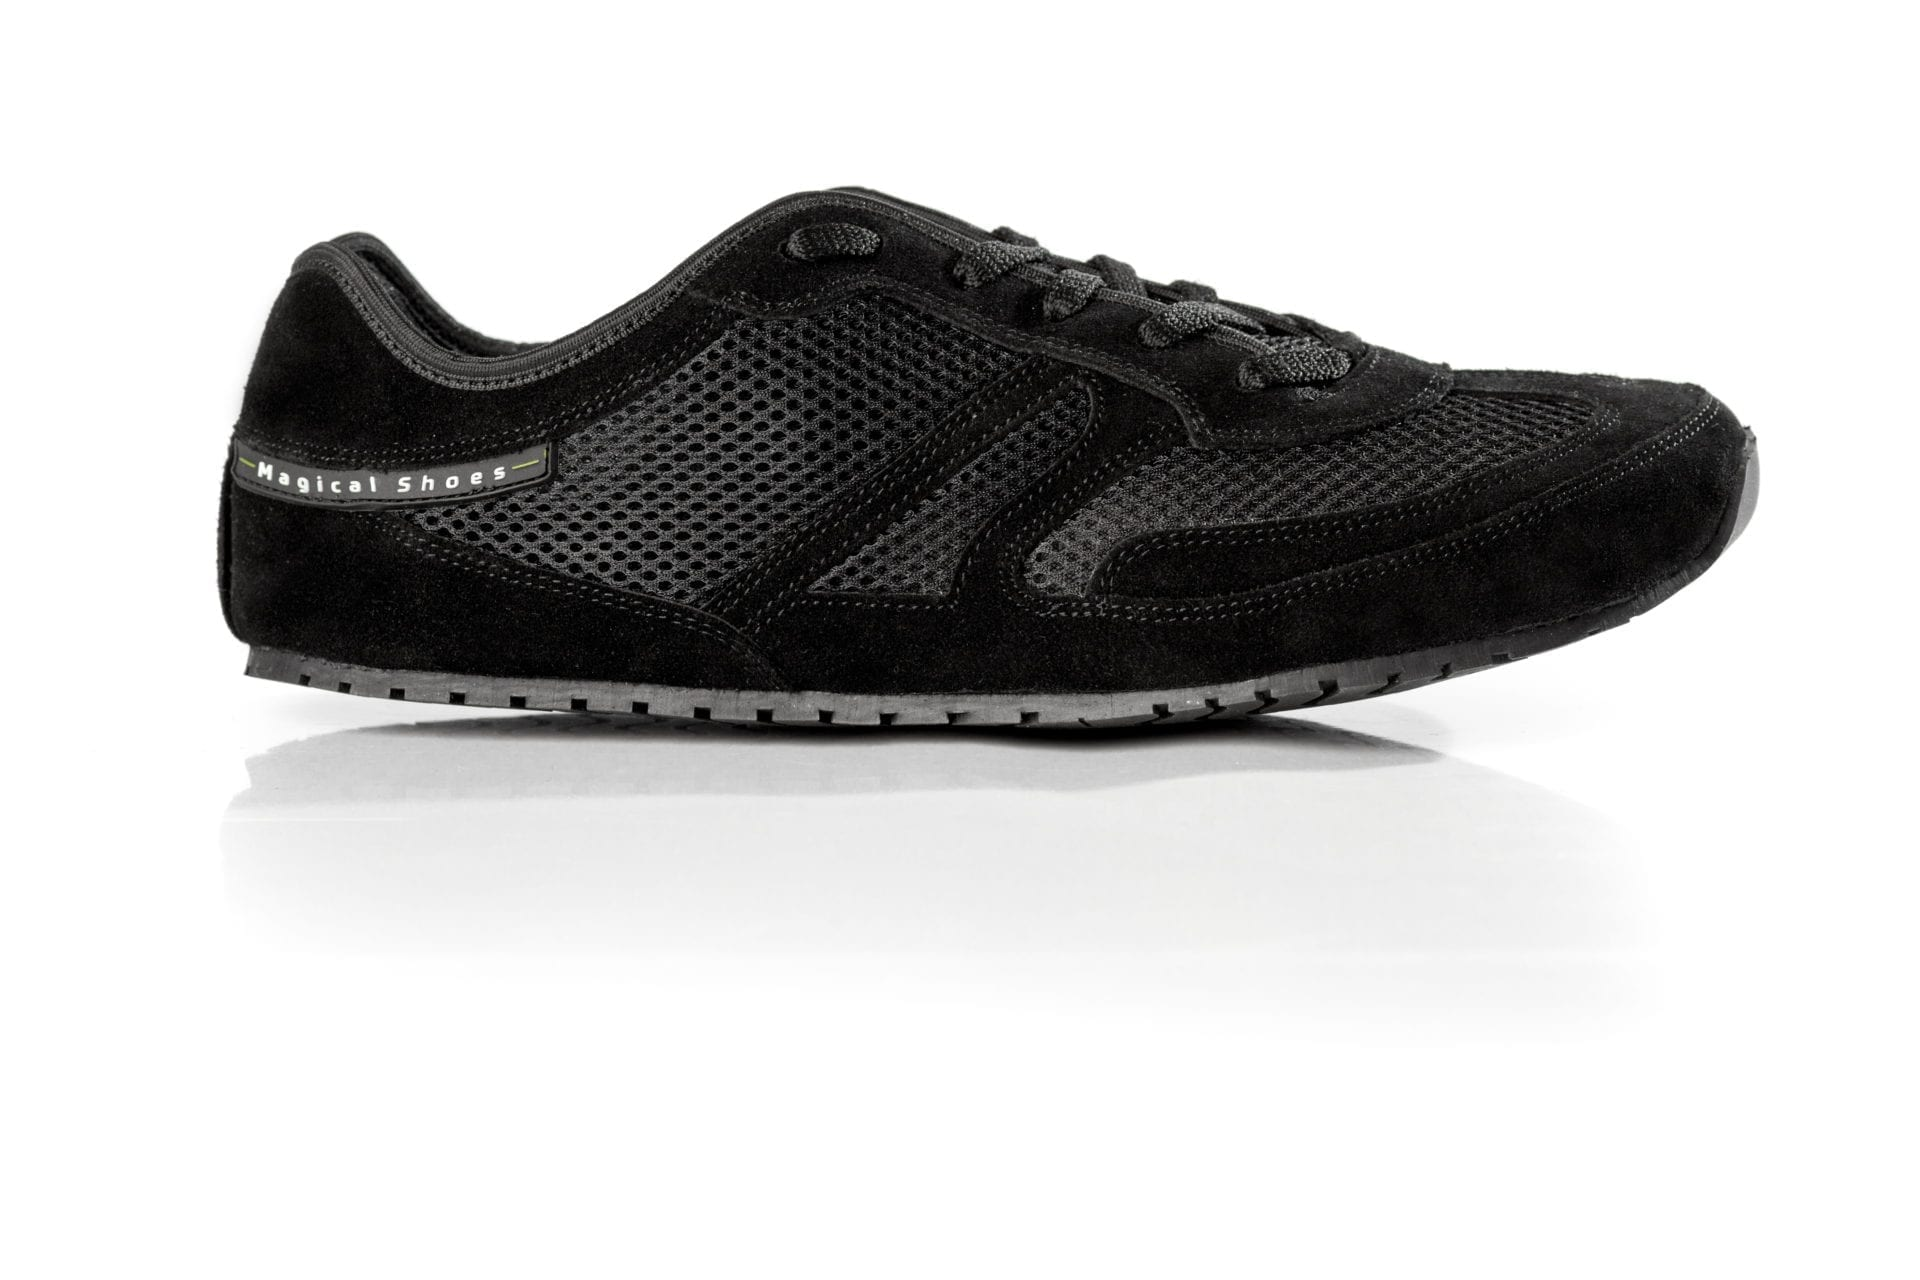 Magical Shoes BAREFOOT SHOES EXPLORER CLASSIC BLACK KIDS picture 4